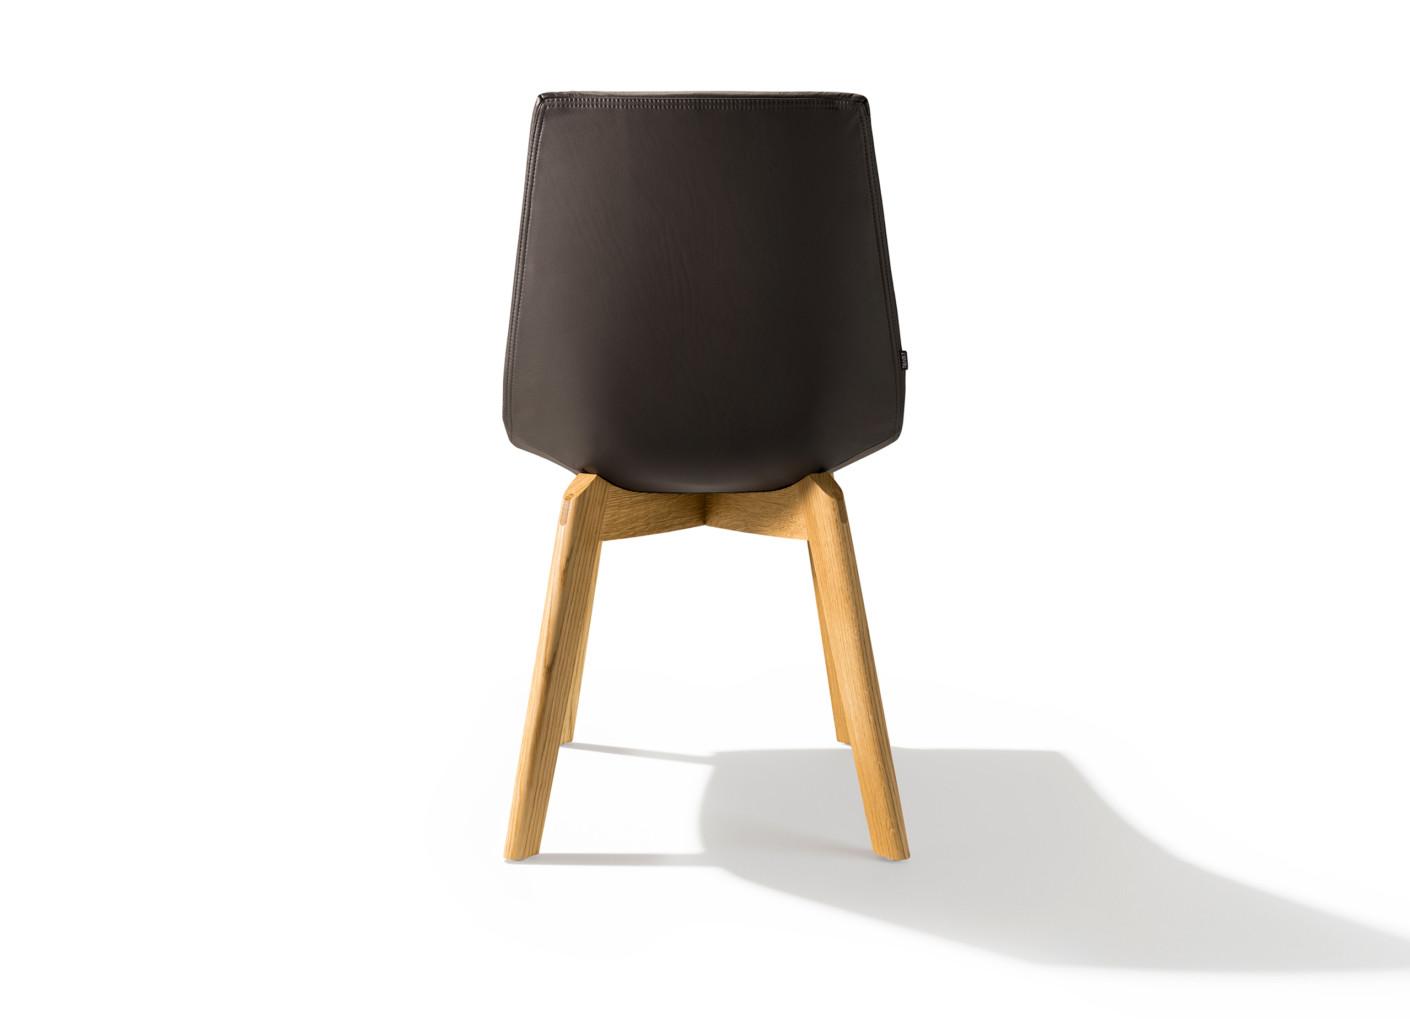 lui stuhl von team 7 stylepark. Black Bedroom Furniture Sets. Home Design Ideas